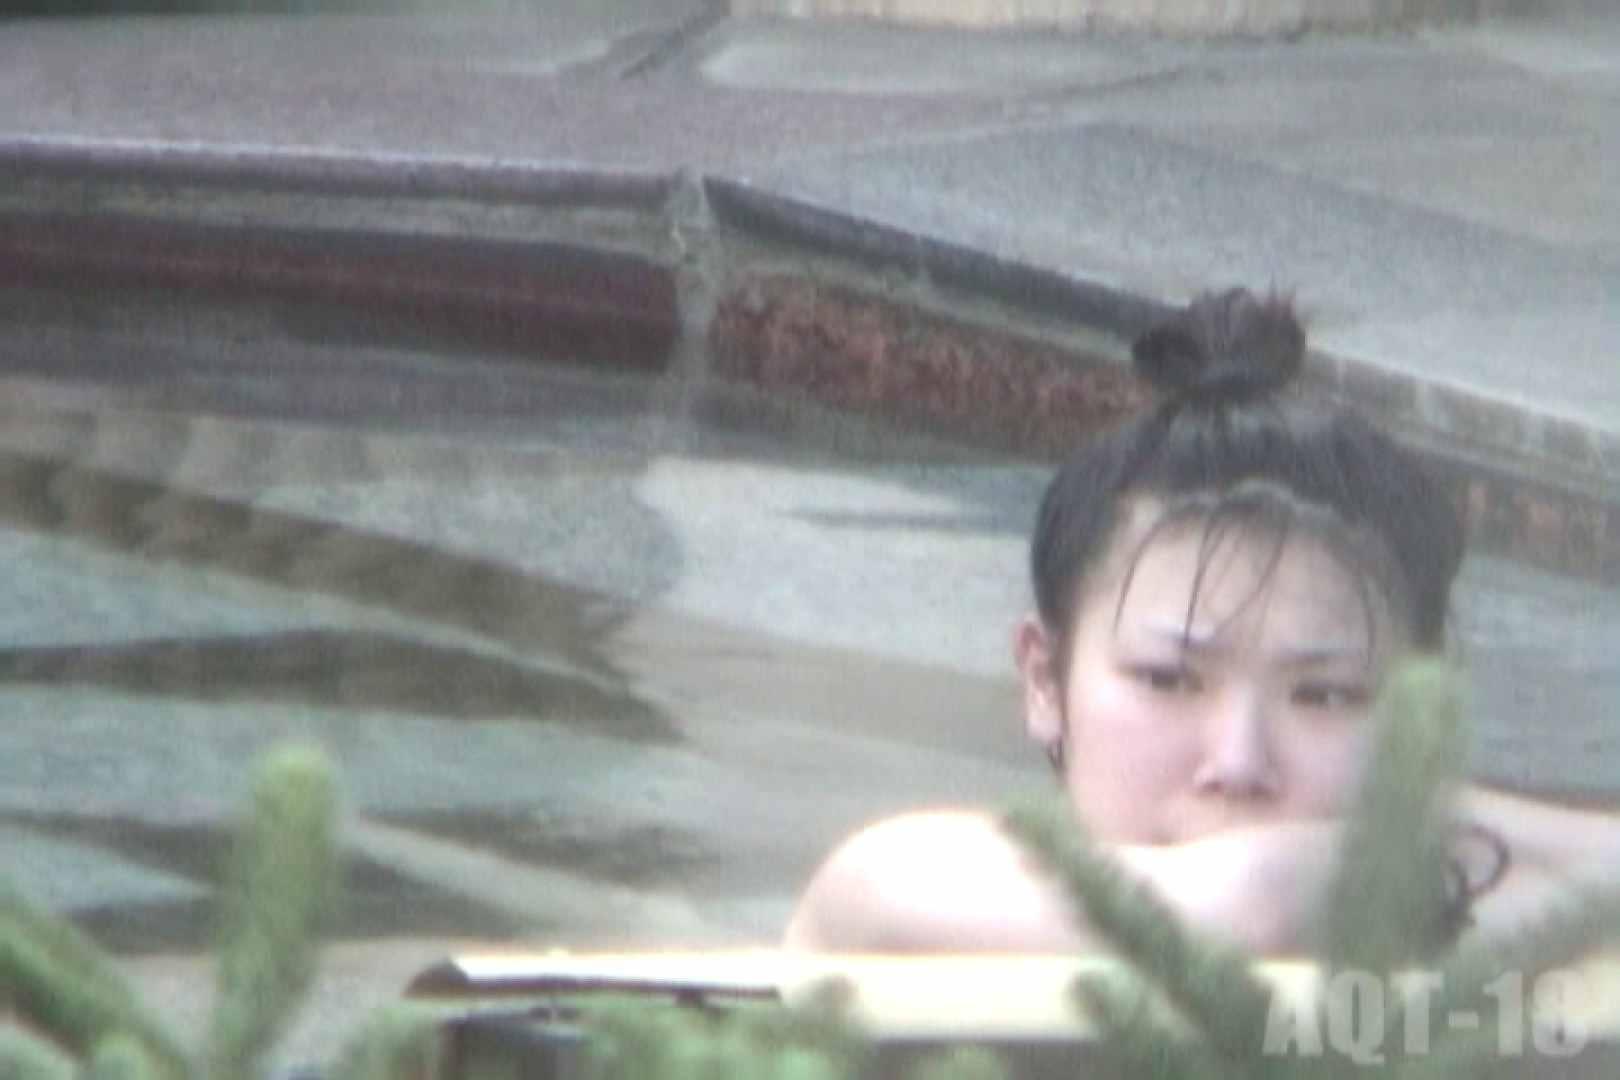 Aquaな露天風呂Vol.855 OLのプライベート  12pic 12